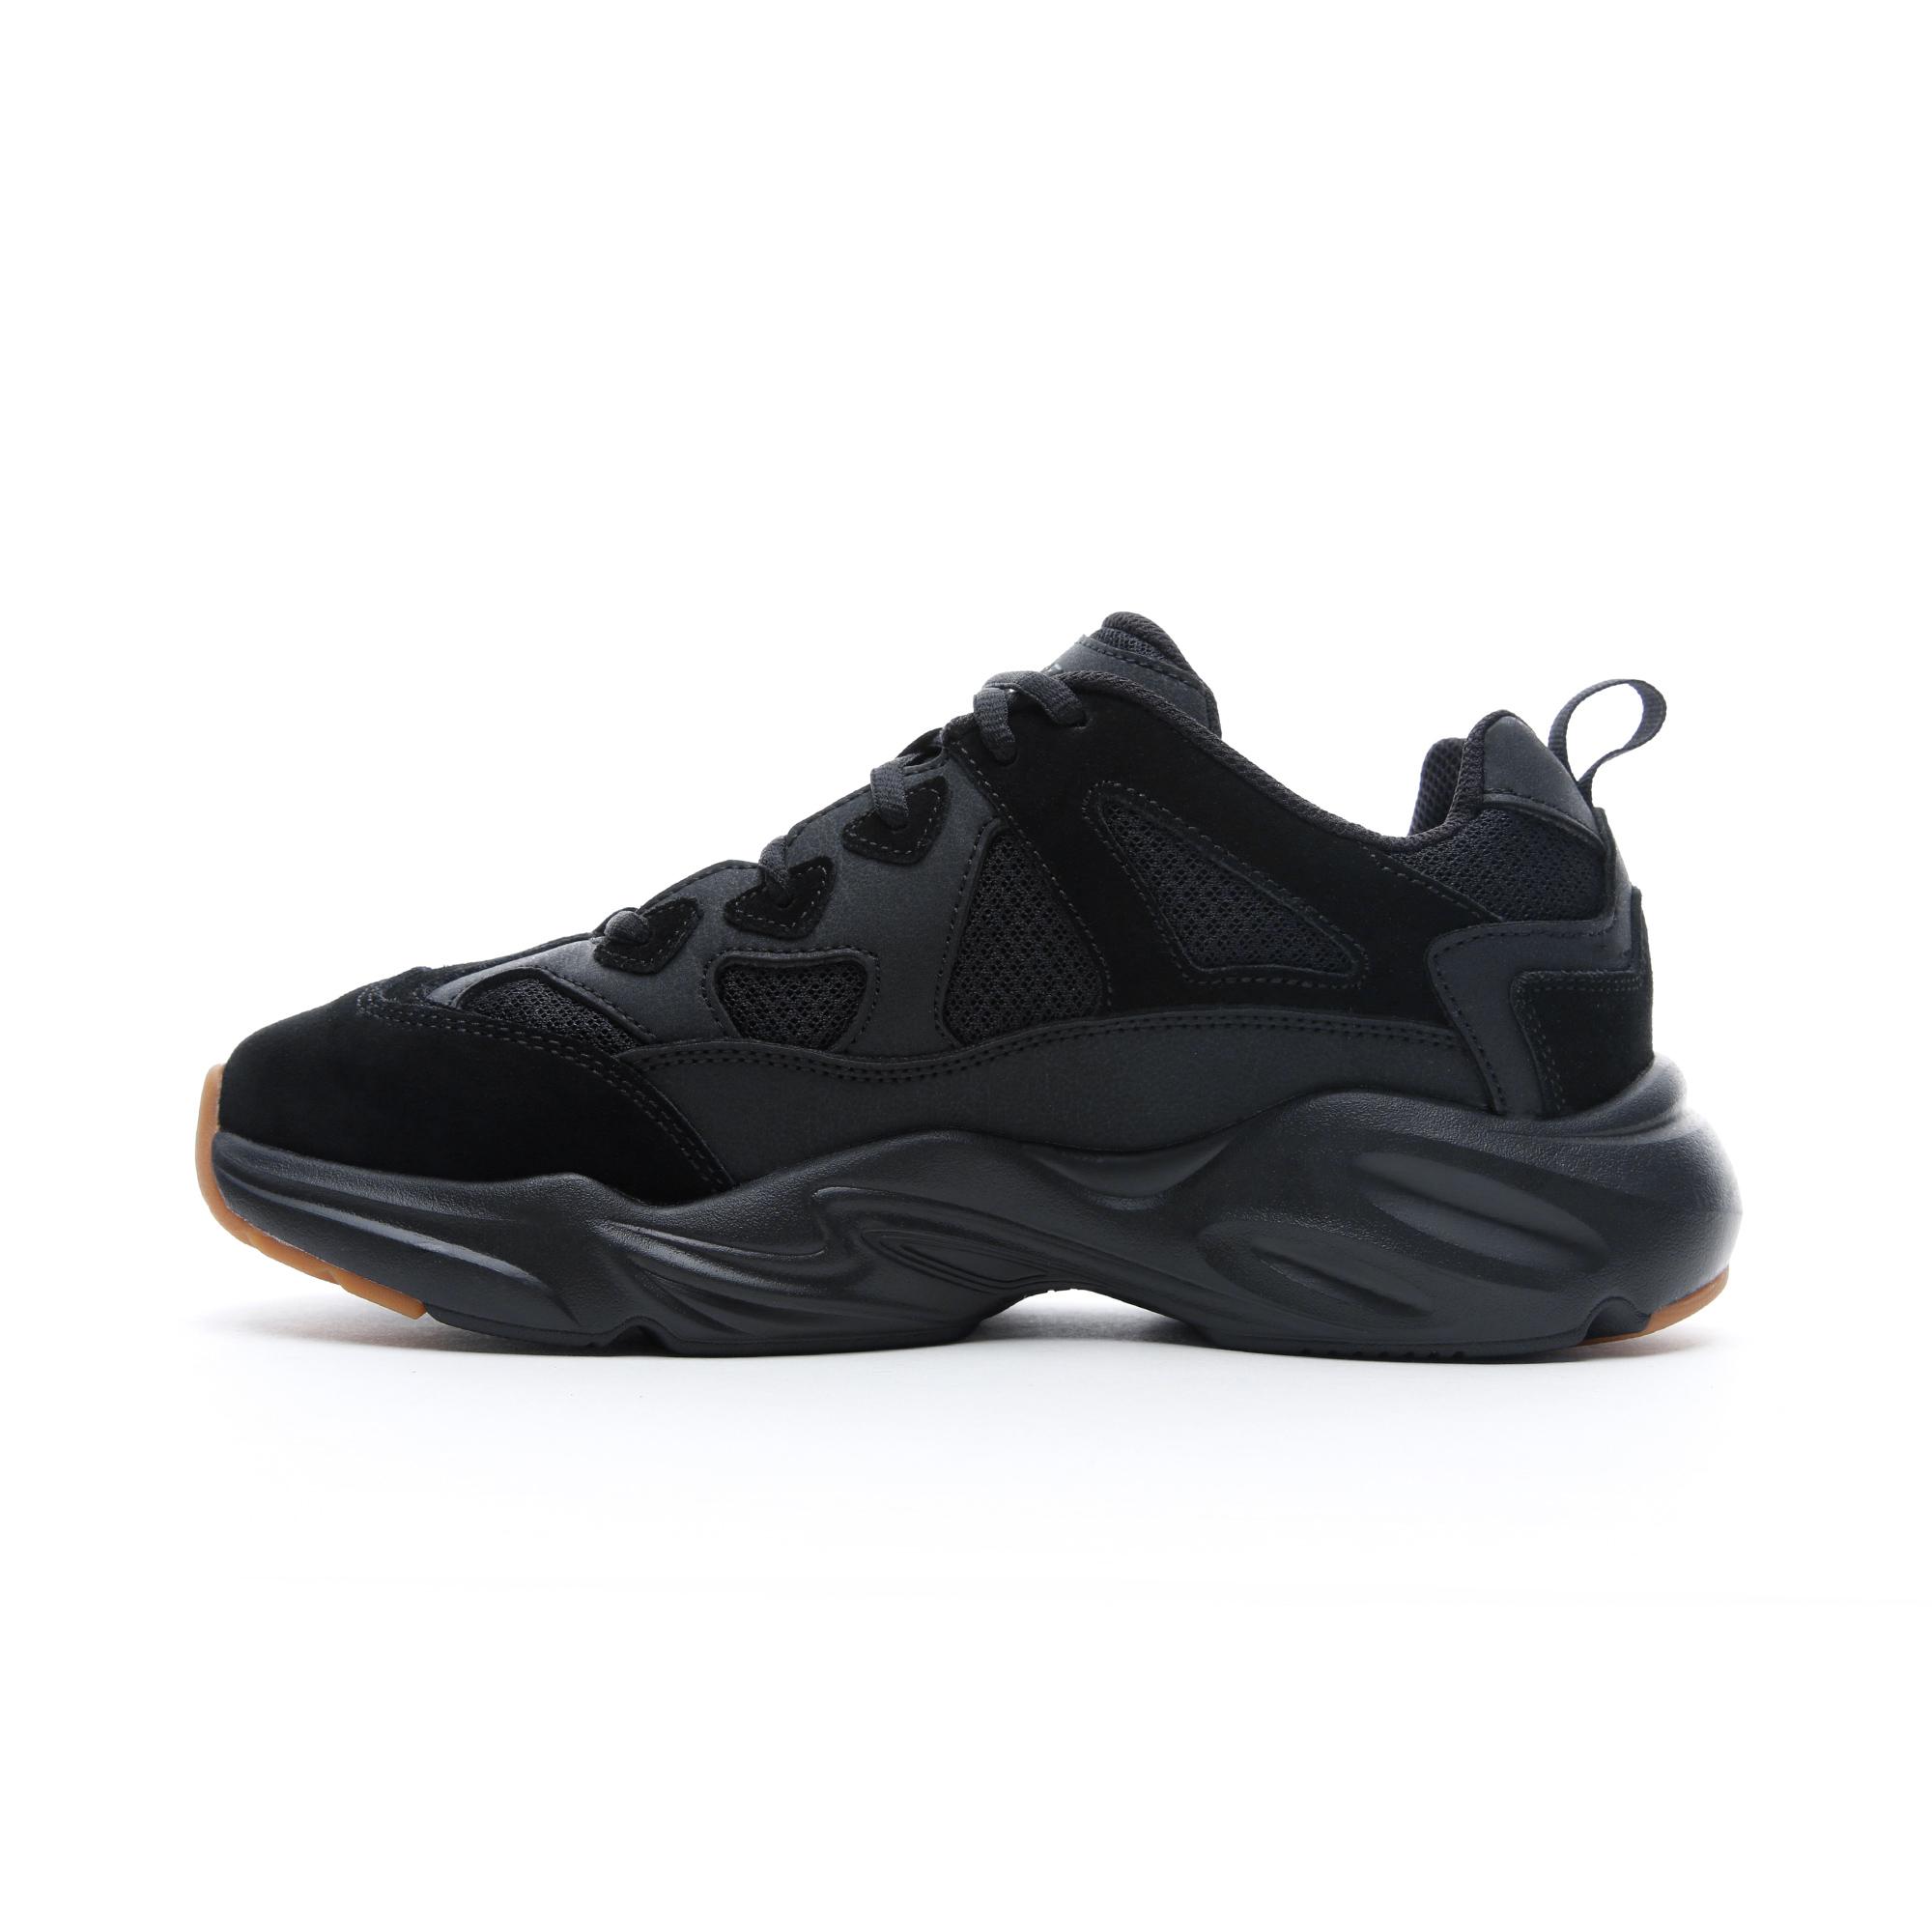 Skechers Stamina Airy Siyah Erkek Spor Ayakkabı